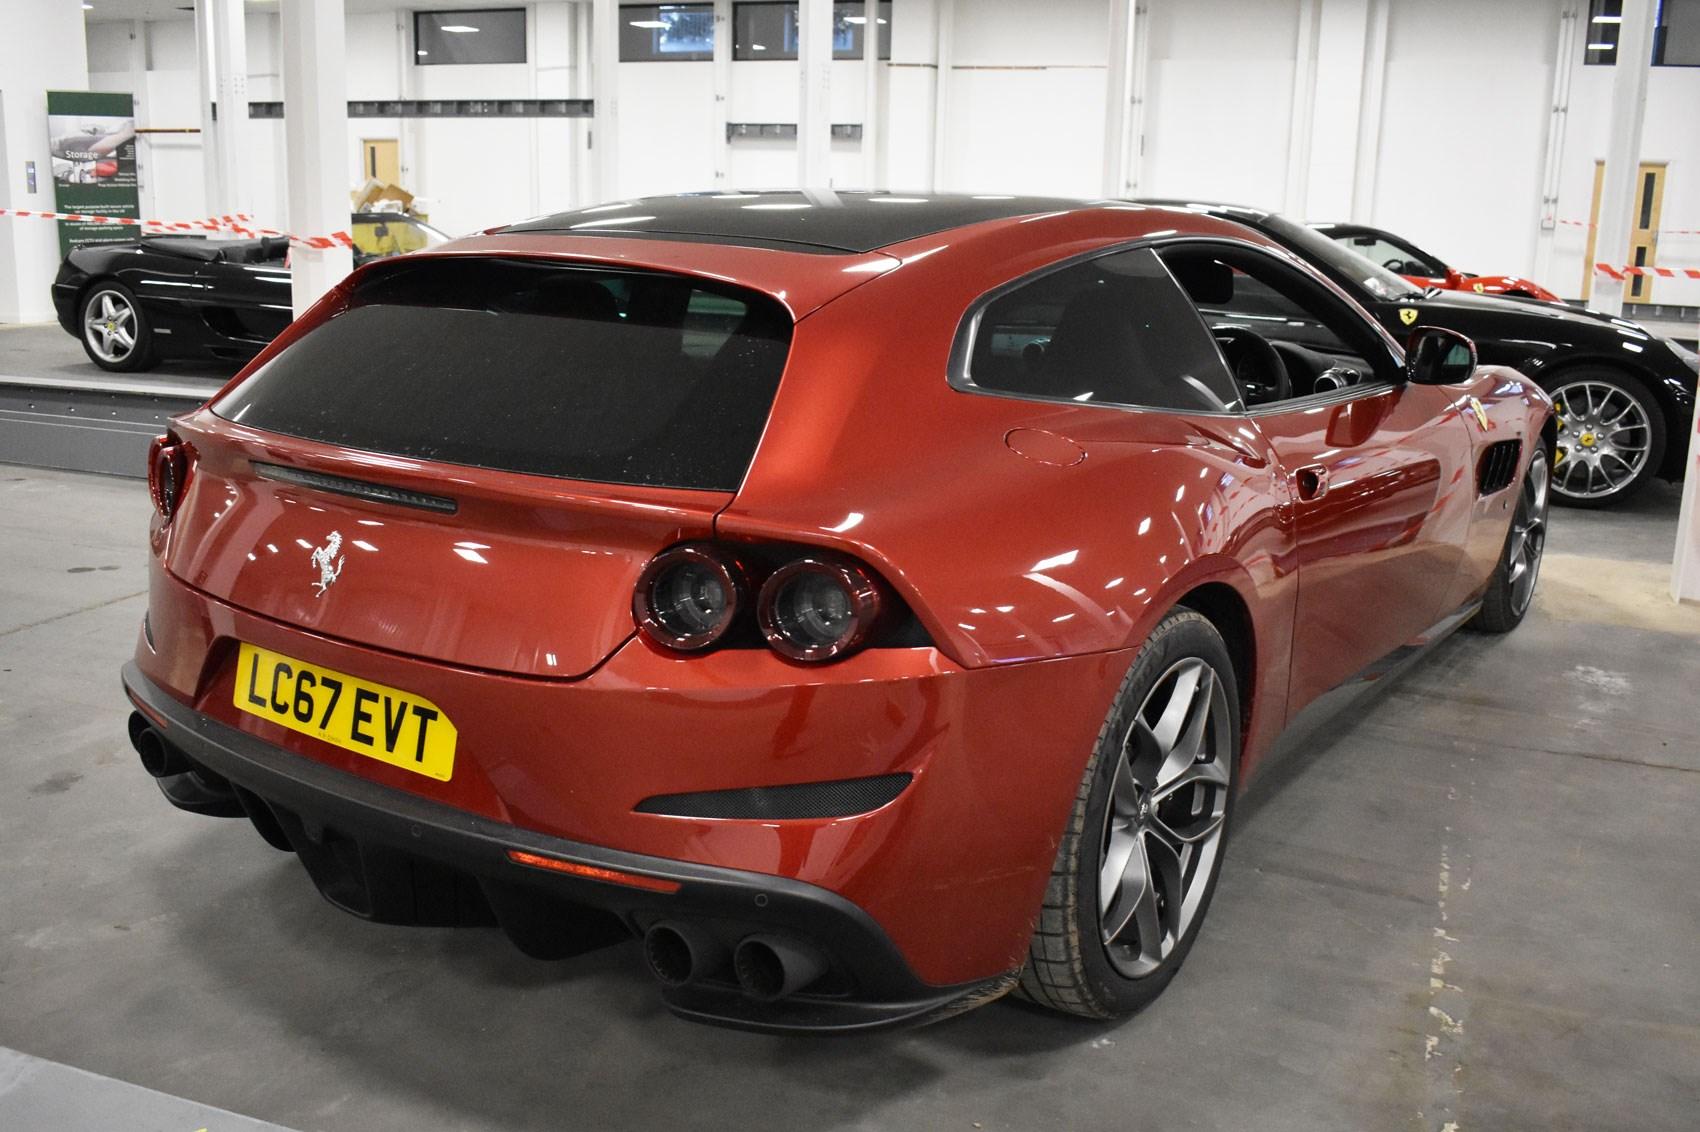 ferrarigtc4lusso Extraordinary Ferrari Mondial 3.4 T Review Cars Trend